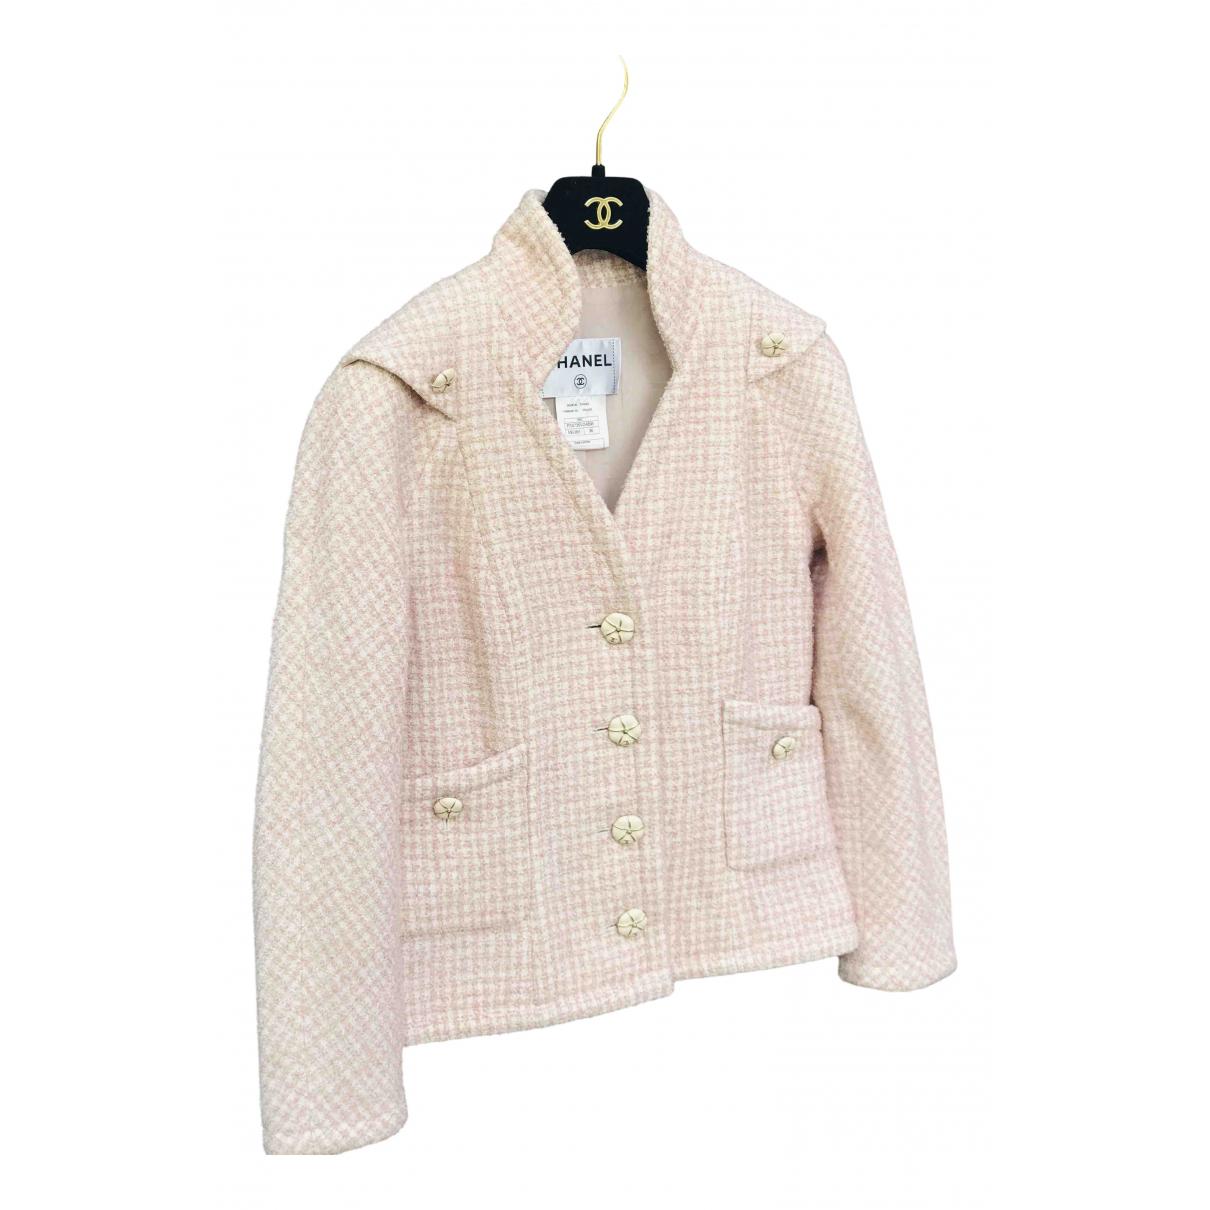 Chanel N Multicolour Tweed jacket for Women 36 FR